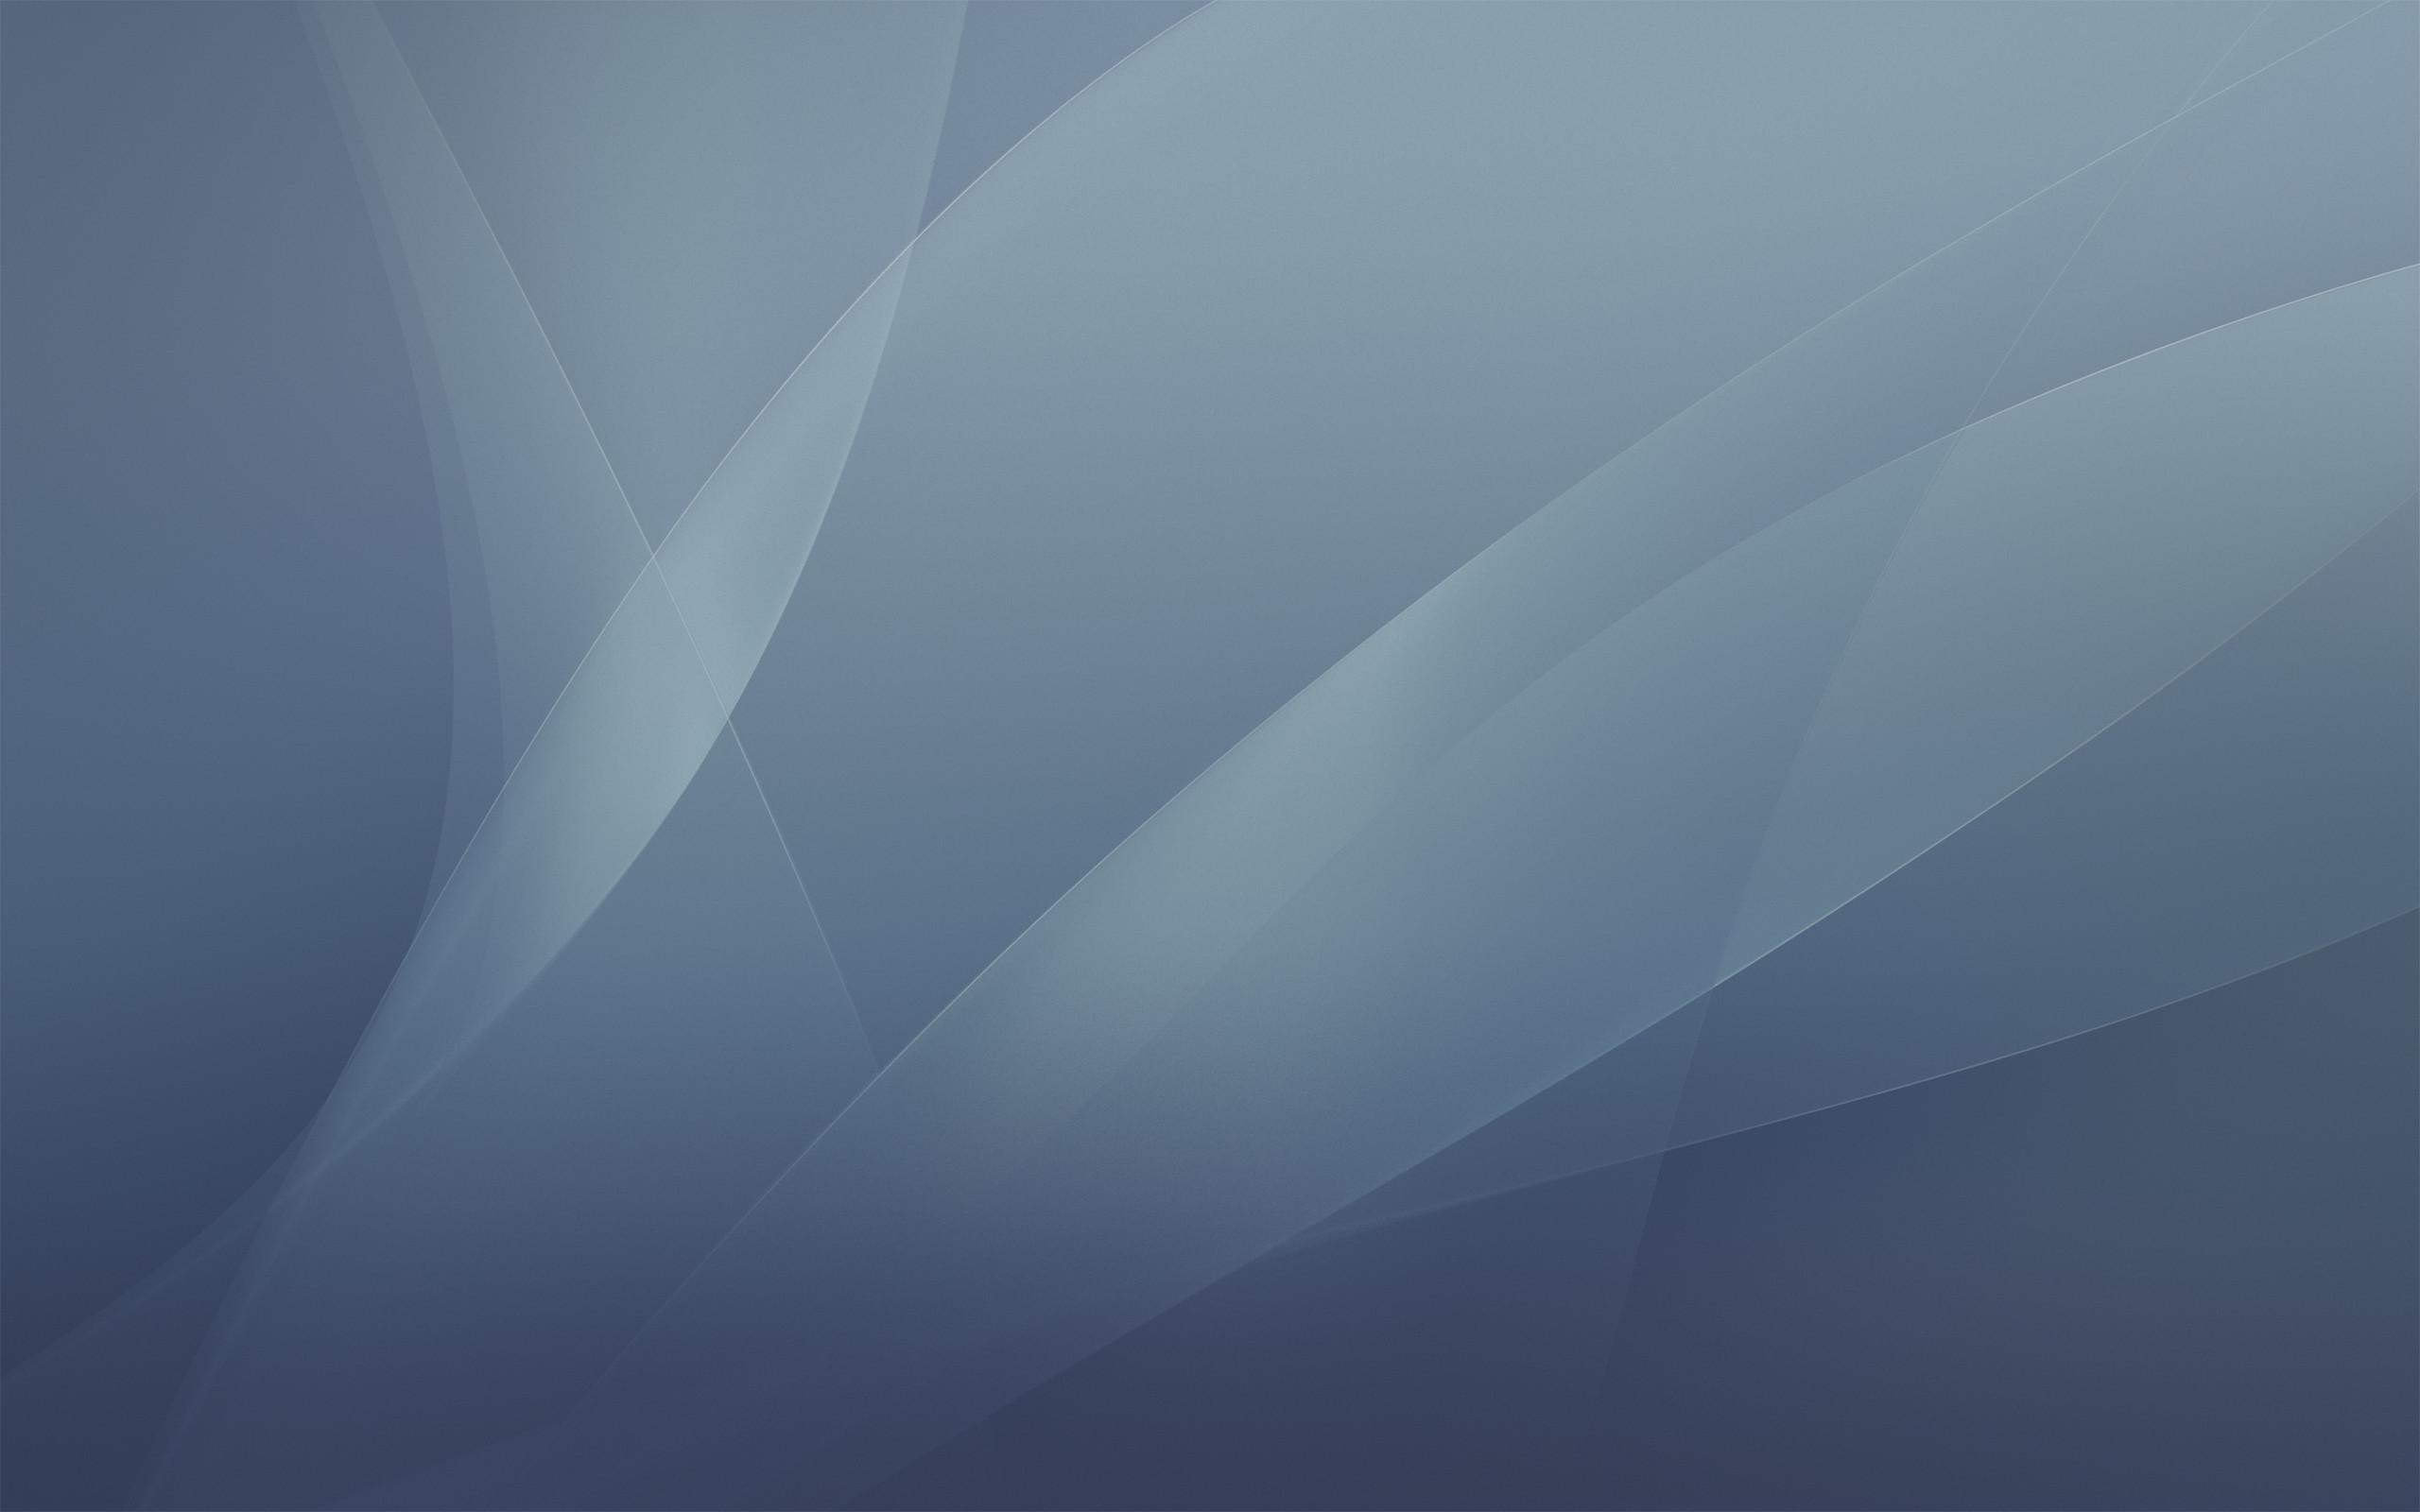 Iphone 5 Default Wallpaper Mac Default Wallpaper 64 Images